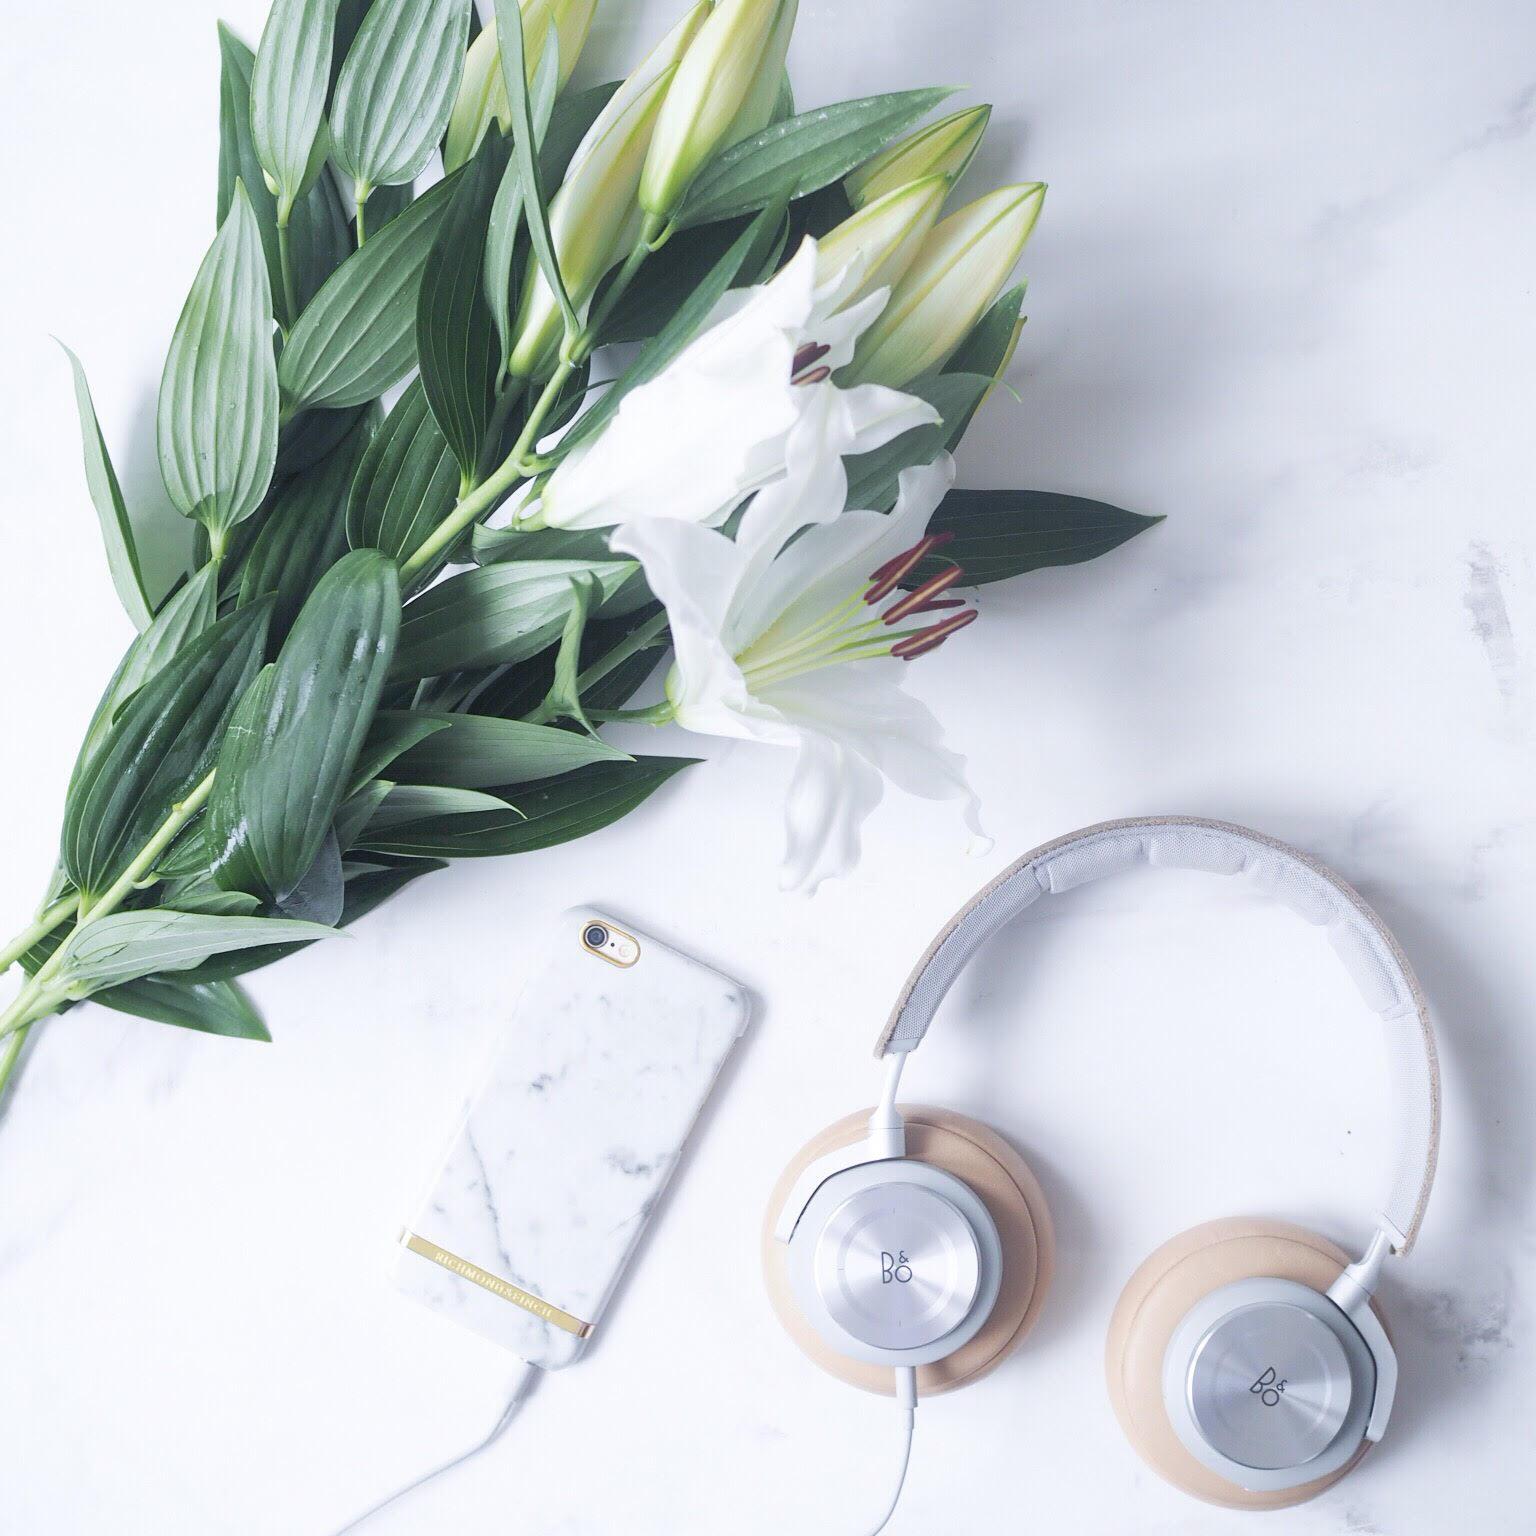 Bang og olufsen - beoplay højtalere i hvid og sølv. Podcast lytning